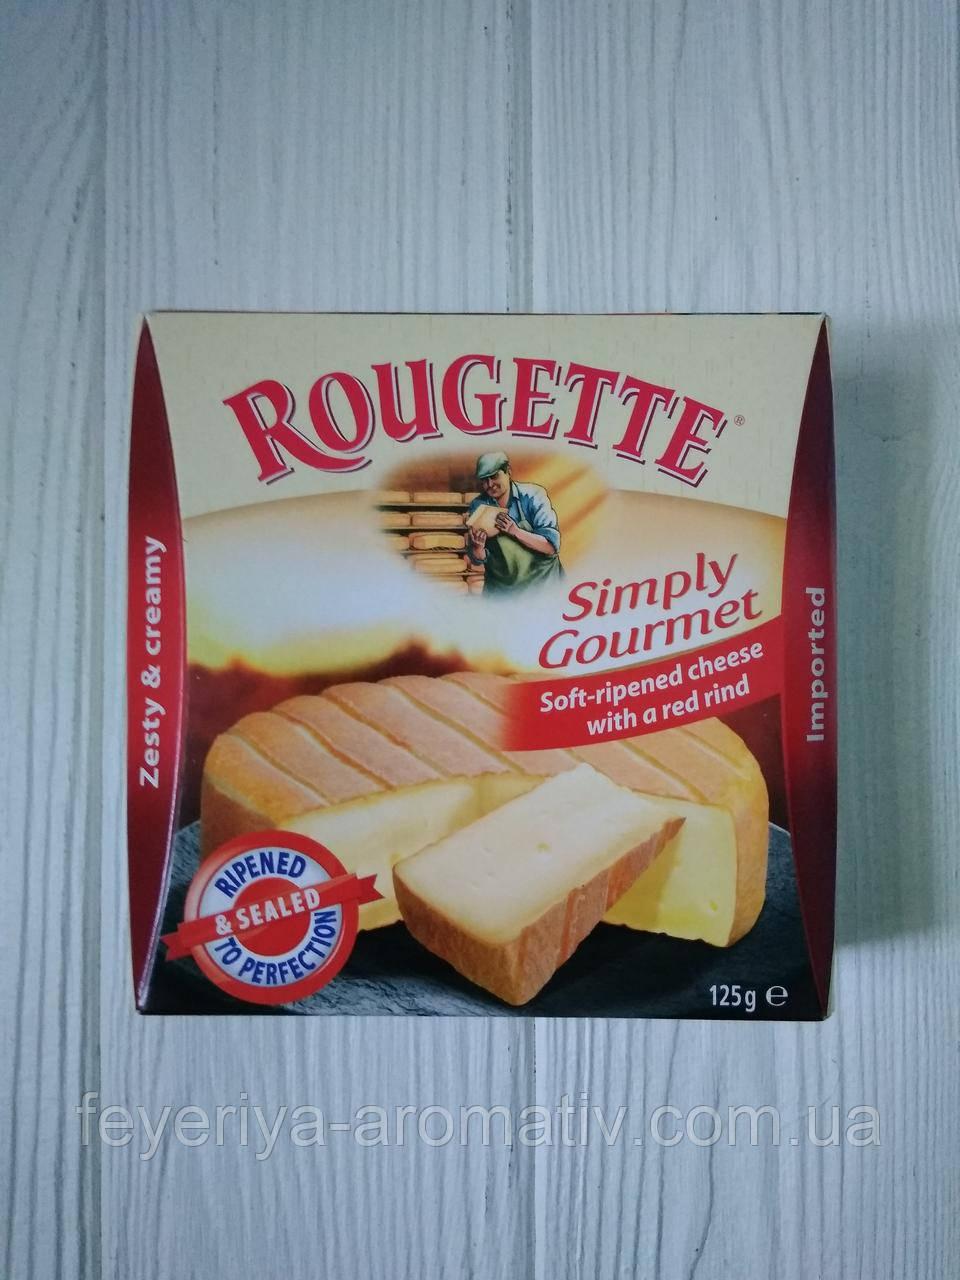 Сыр с красной плесенью Rougette Simply Gourmet 125гр (Германия)